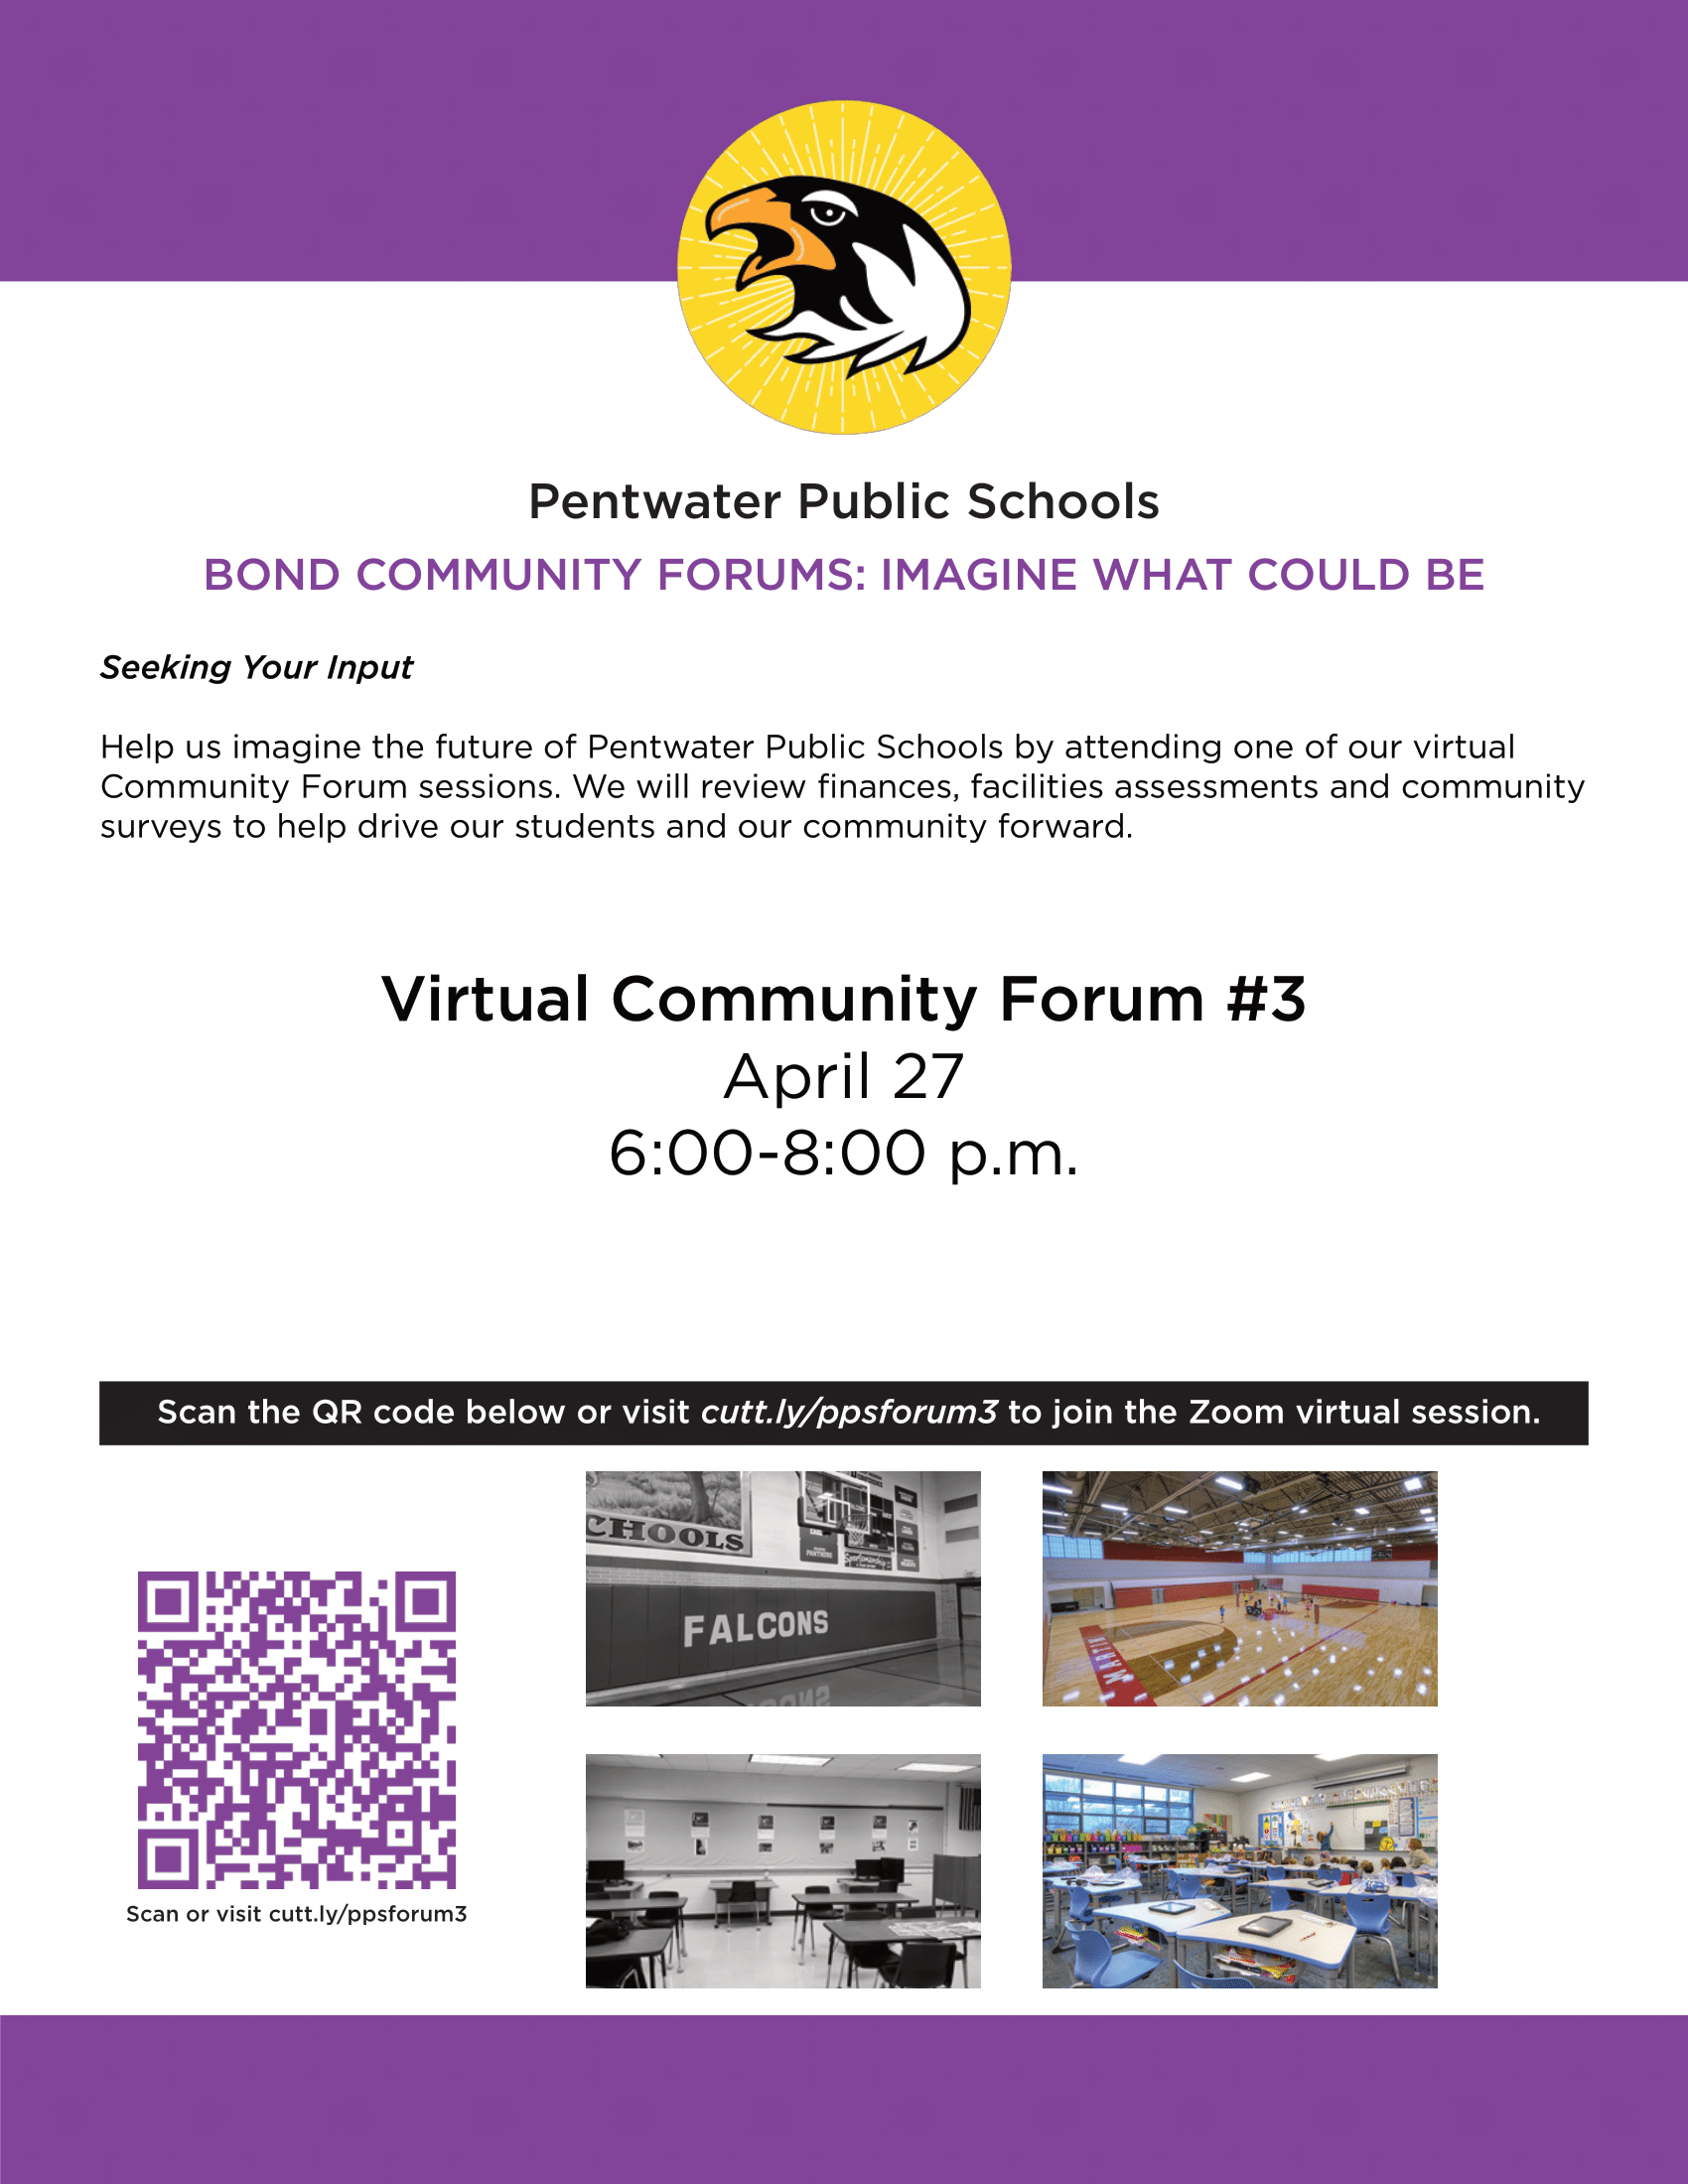 Community Forum Flyer